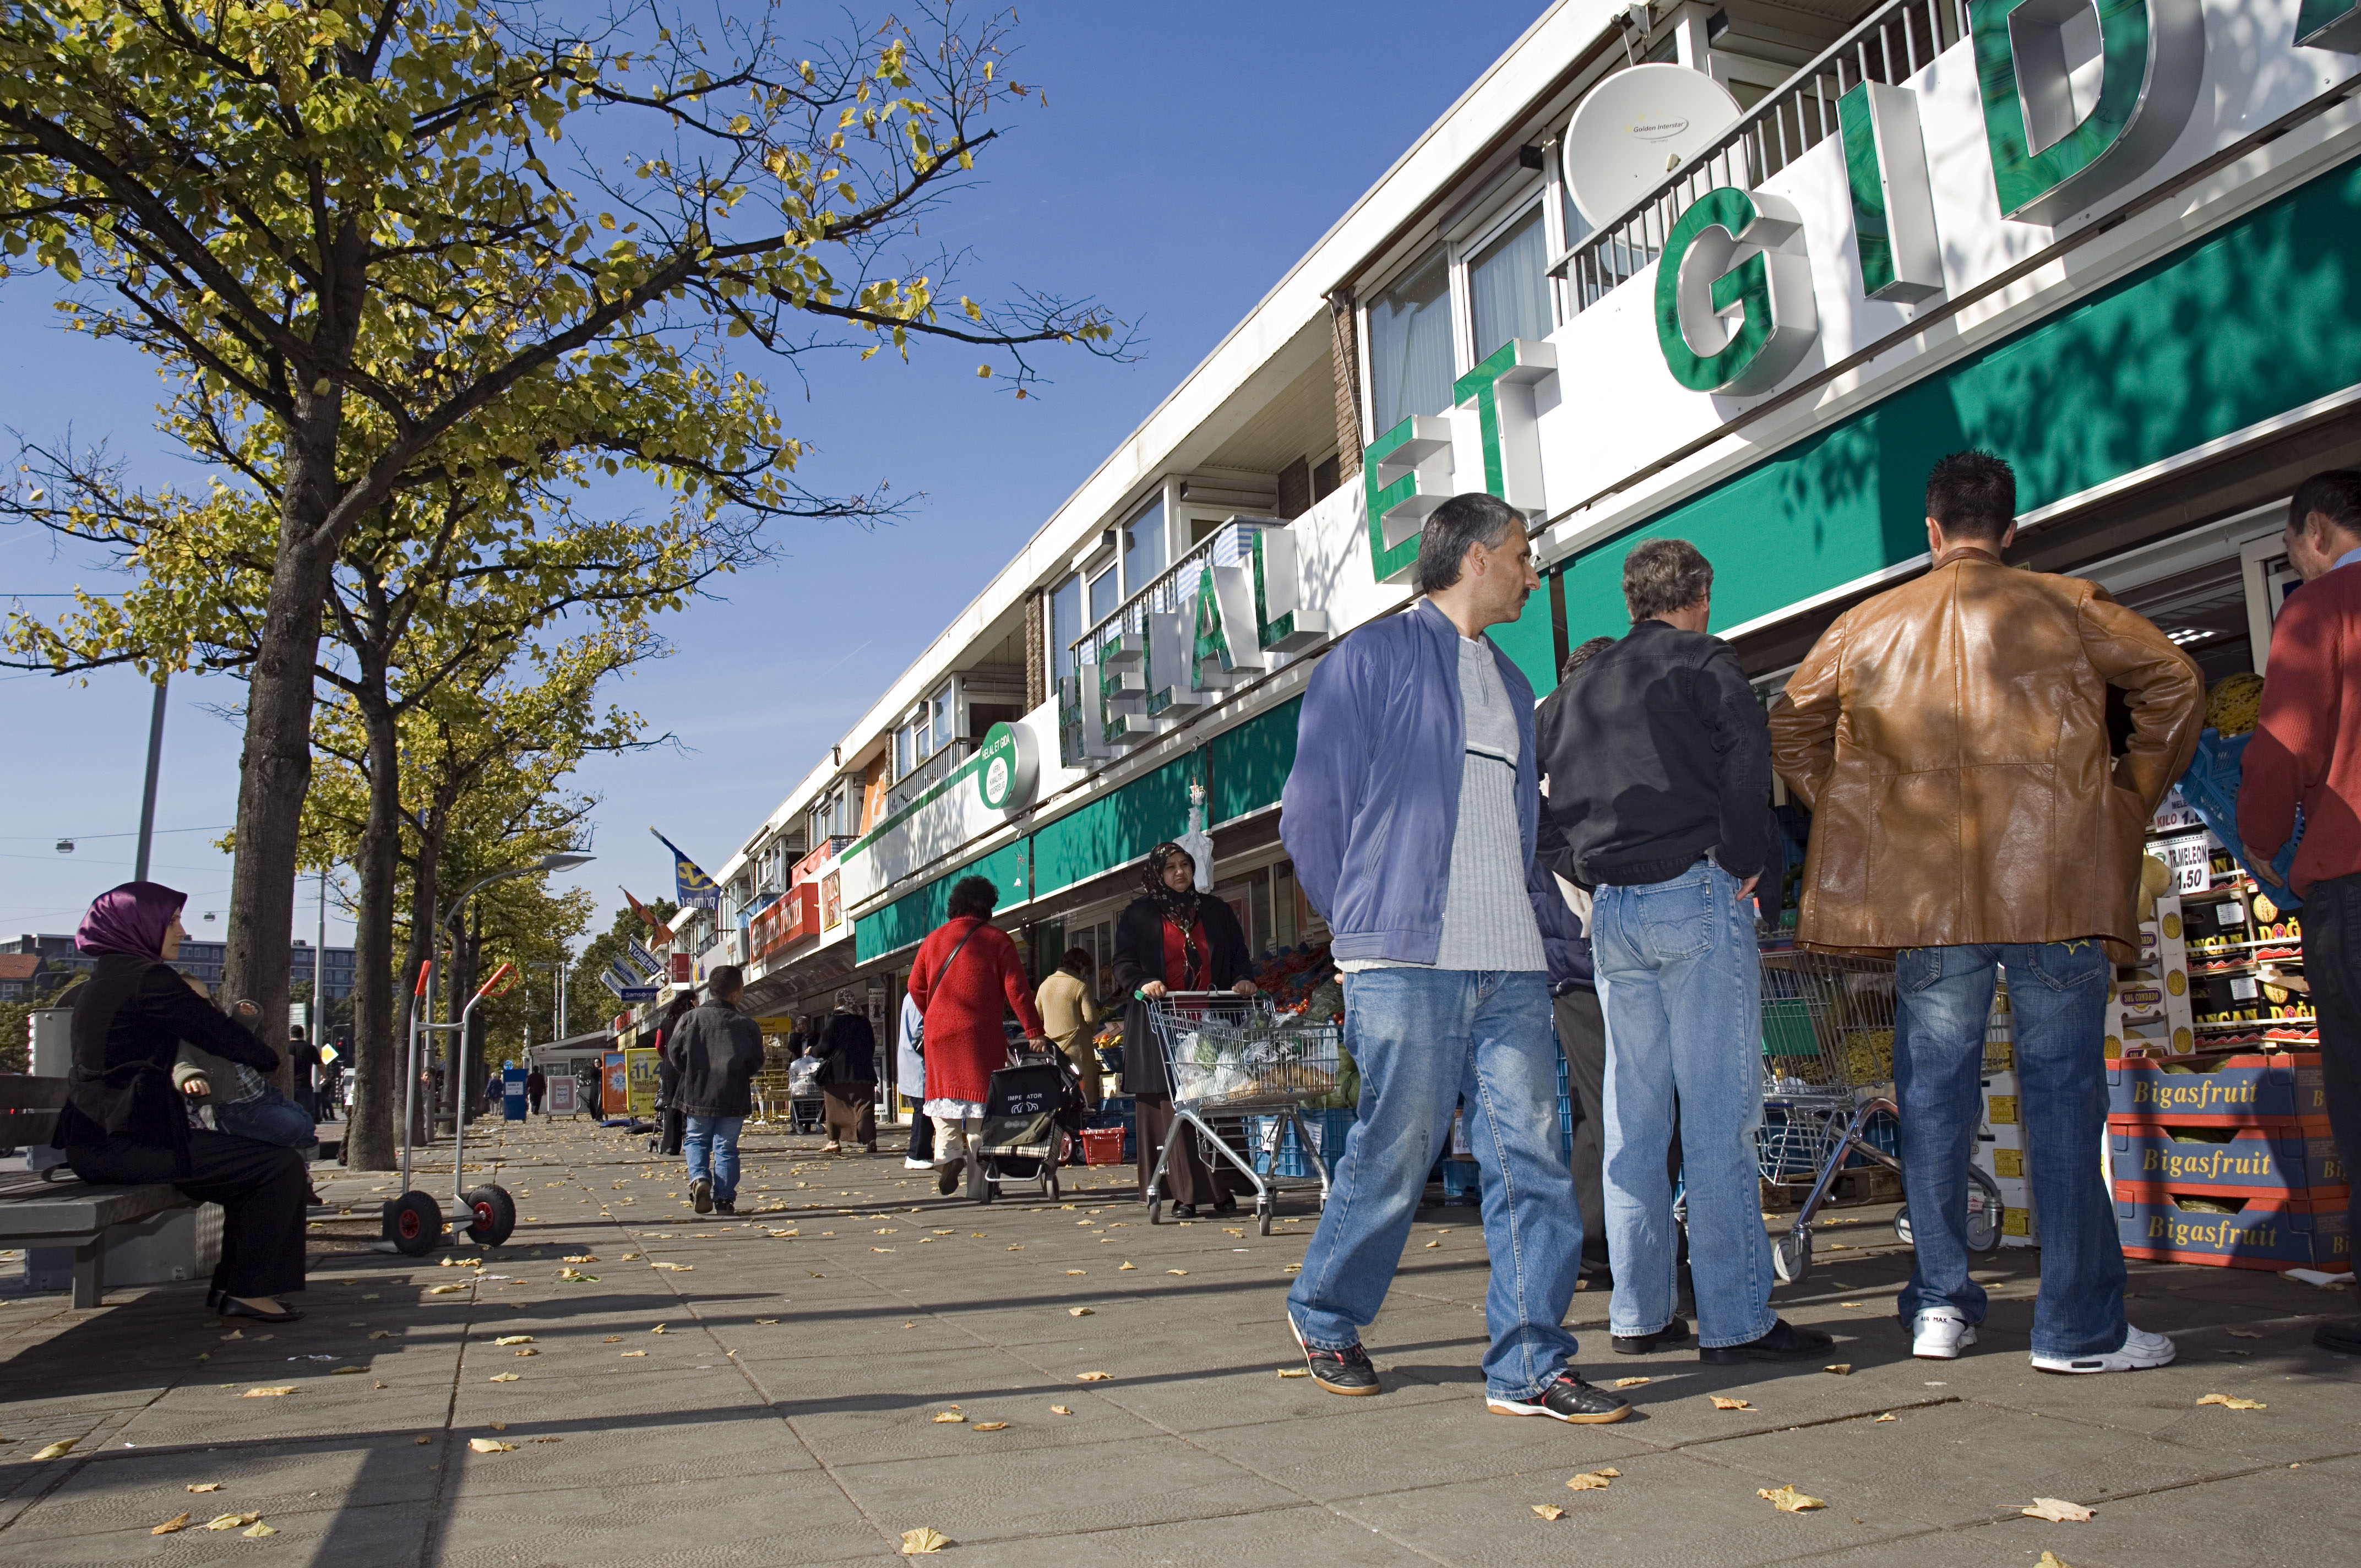 De meest turkse winkelstraat van amsterdam nrc for Turkse restaurant amsterdam west